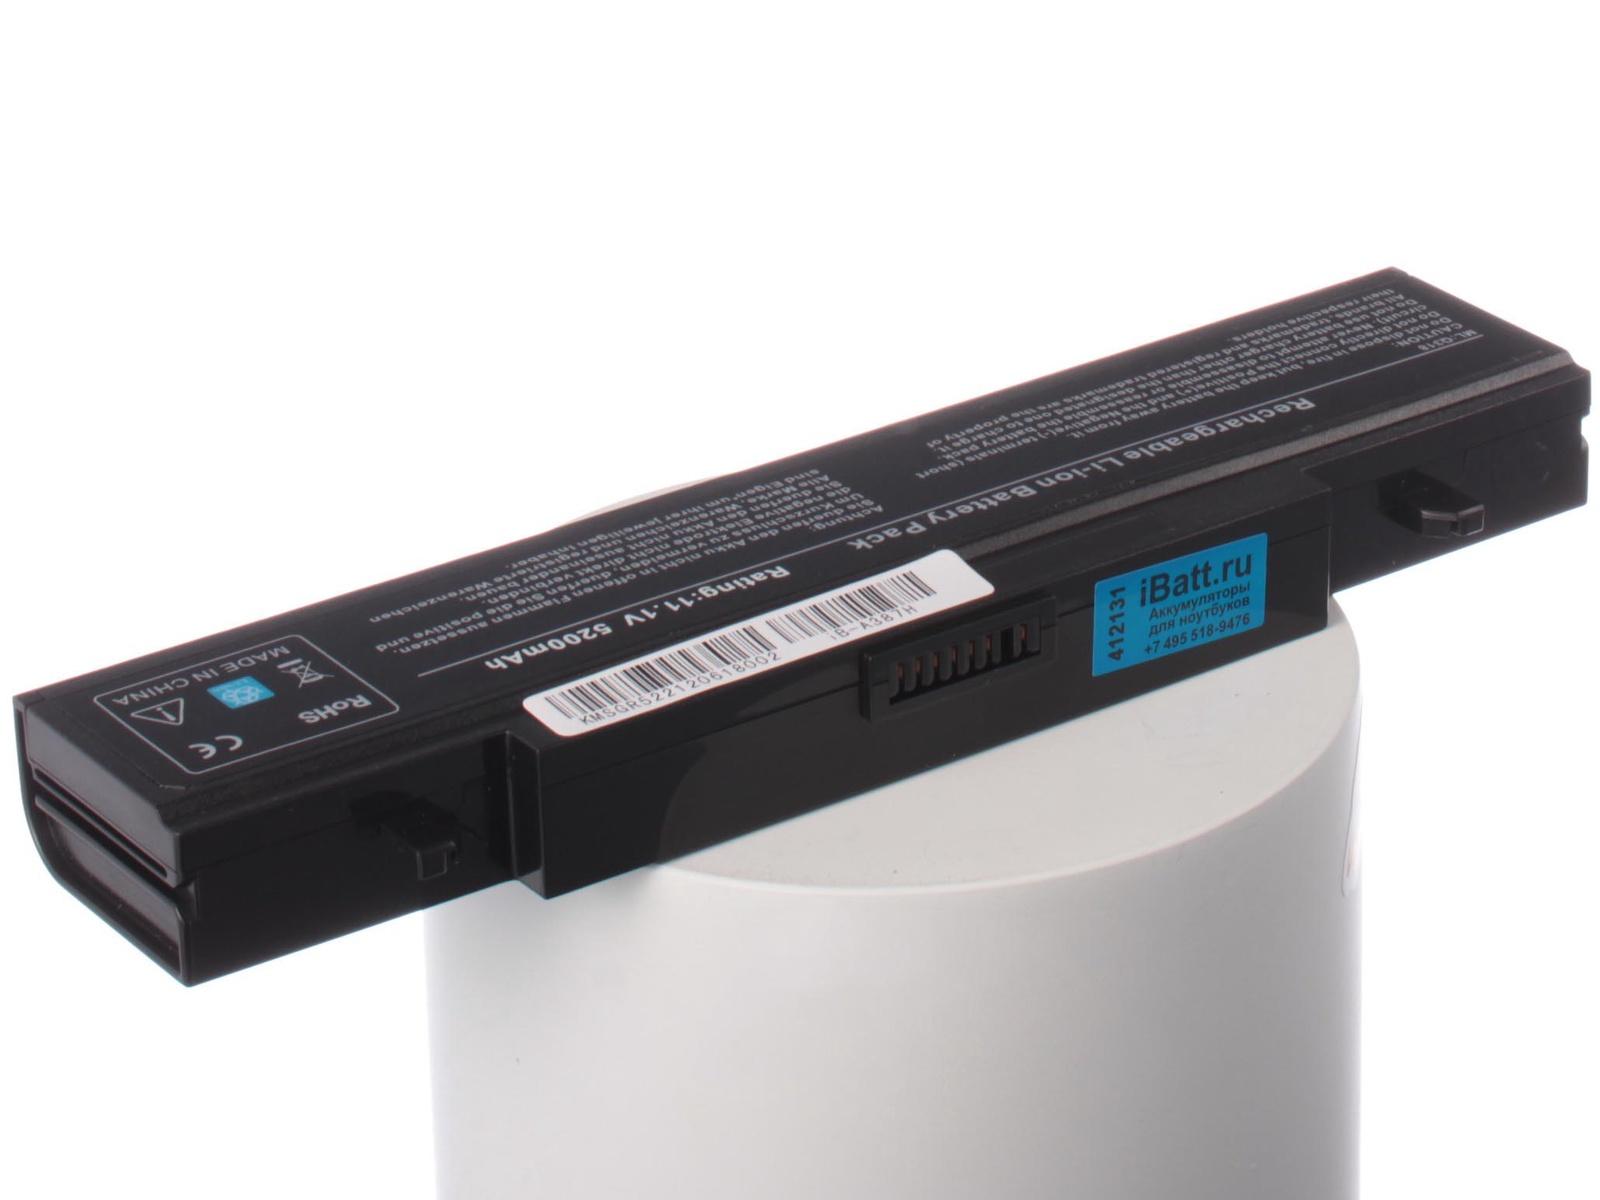 Аккумулятор для ноутбука iBatt для Samsung R540-JT01, NP365E5C, R730-JT02, 300E5C-U04, 300V5A-S1C, R540-JT03, R730-JA03, R780-JT01, RF710-S02, 270E5E-K03, 305E7A-S01, 350E5C-S07, 550P7C-S03, NP-Q430, NP-R523, R540-JS0B аккумулятор для ноутбука anybatt для samsung r540 jt01 np365e5c r730 jt02 300e5c u04 300v5a s1c r540 jt03 r730 ja03 r780 jt01 rf710 s02 270e5e k03 305e7a s01 350e5c s07 550p7c s03 np q430 np r523 r540 js0b